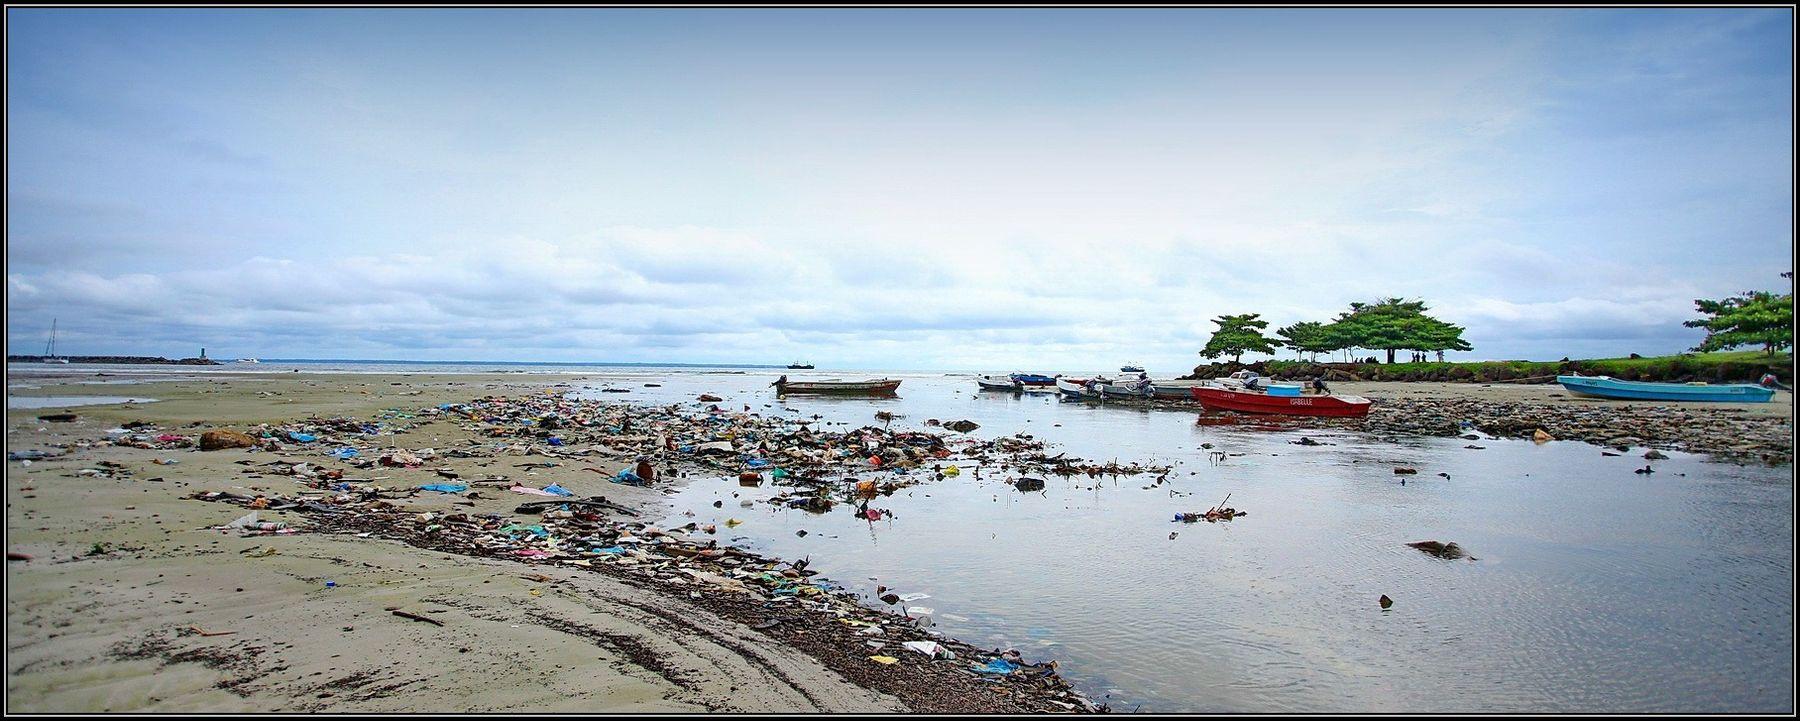 Рыбацкая лагуна африка габон либревиль океан залив лагуна